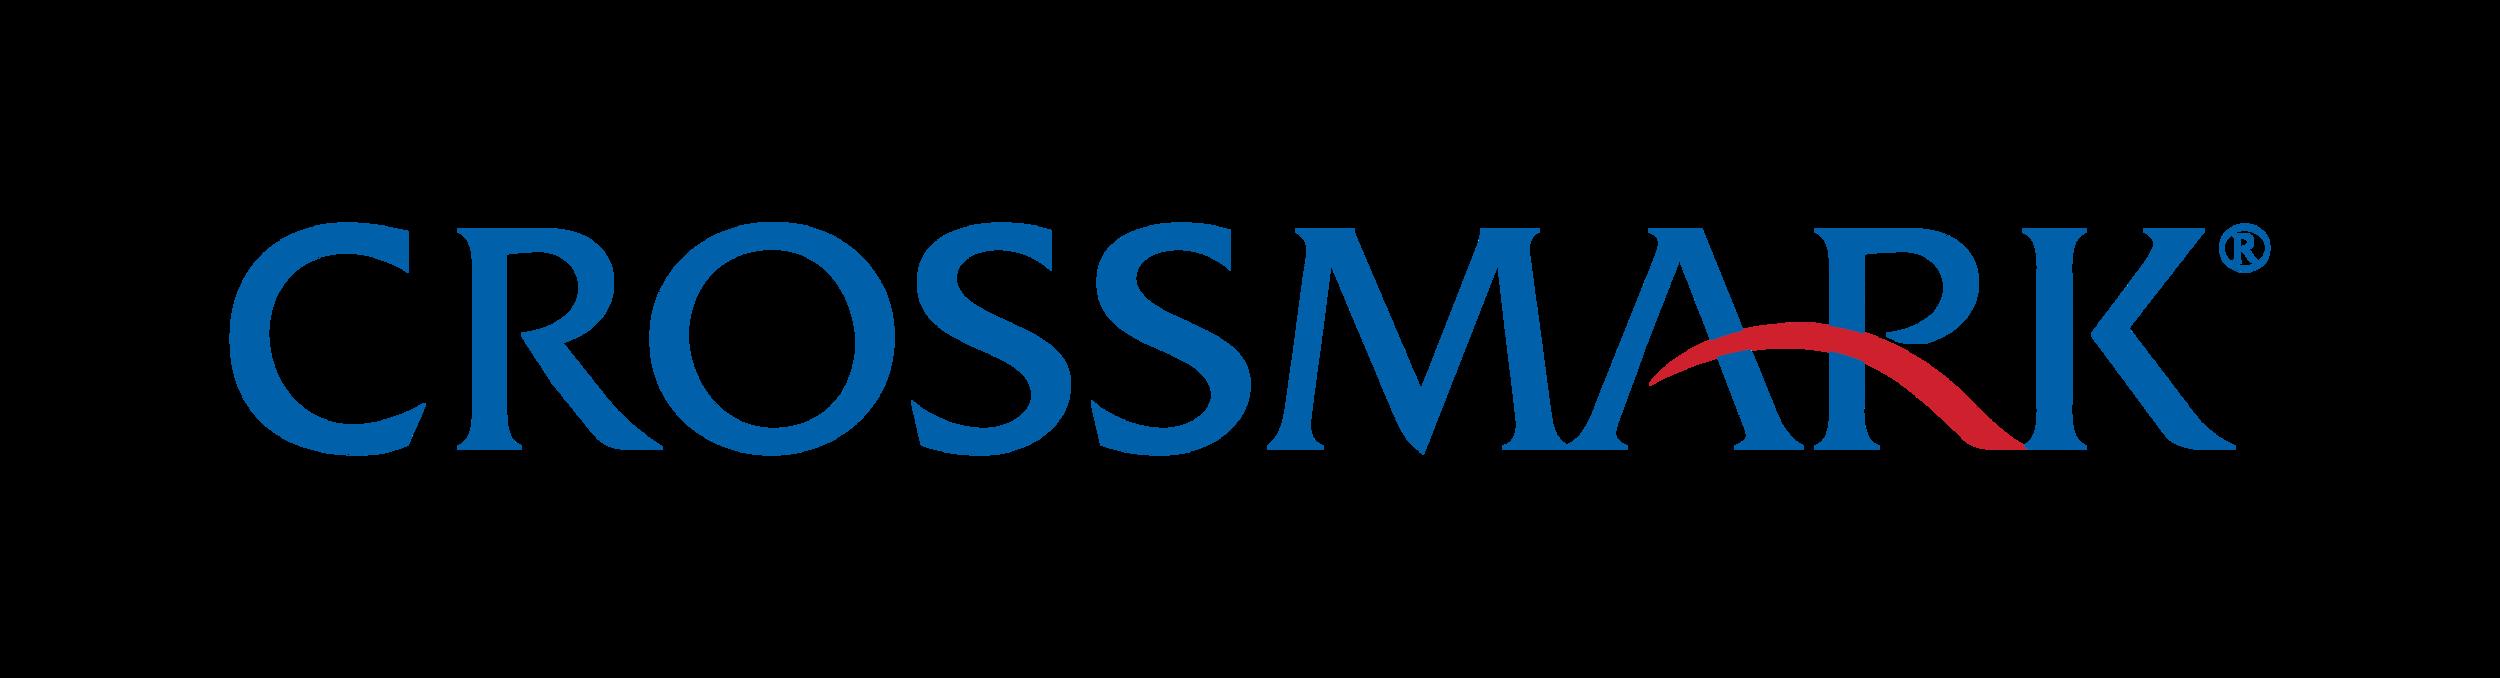 CROSSMARK_logo_RGB.png